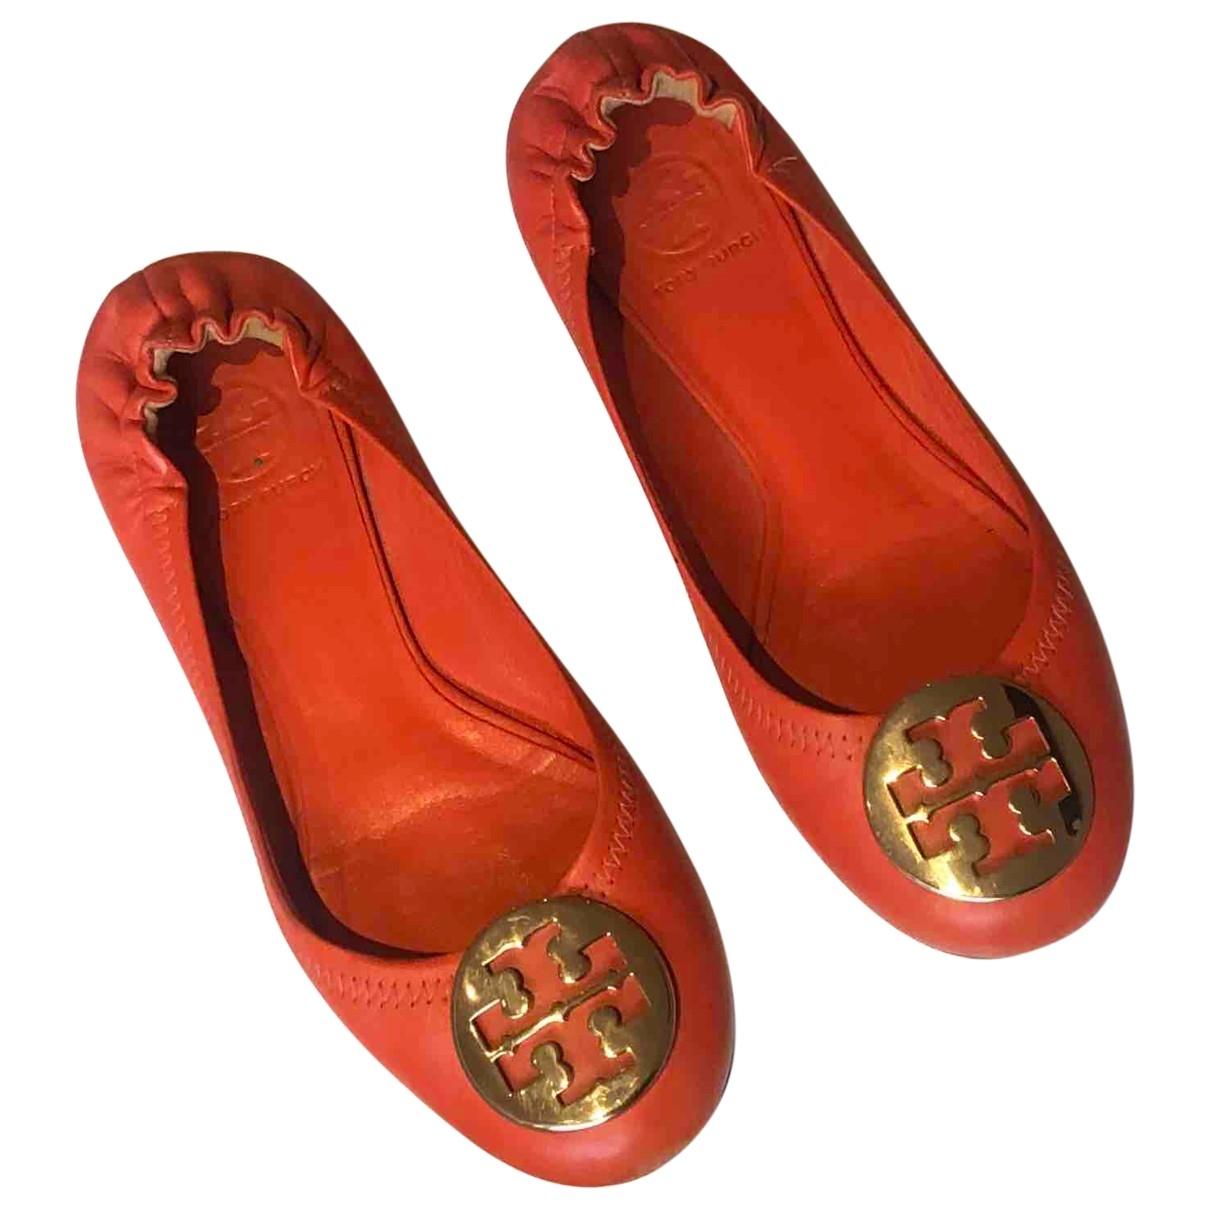 Tory Burch \N Orange Leather Ballet flats for Women 7 US